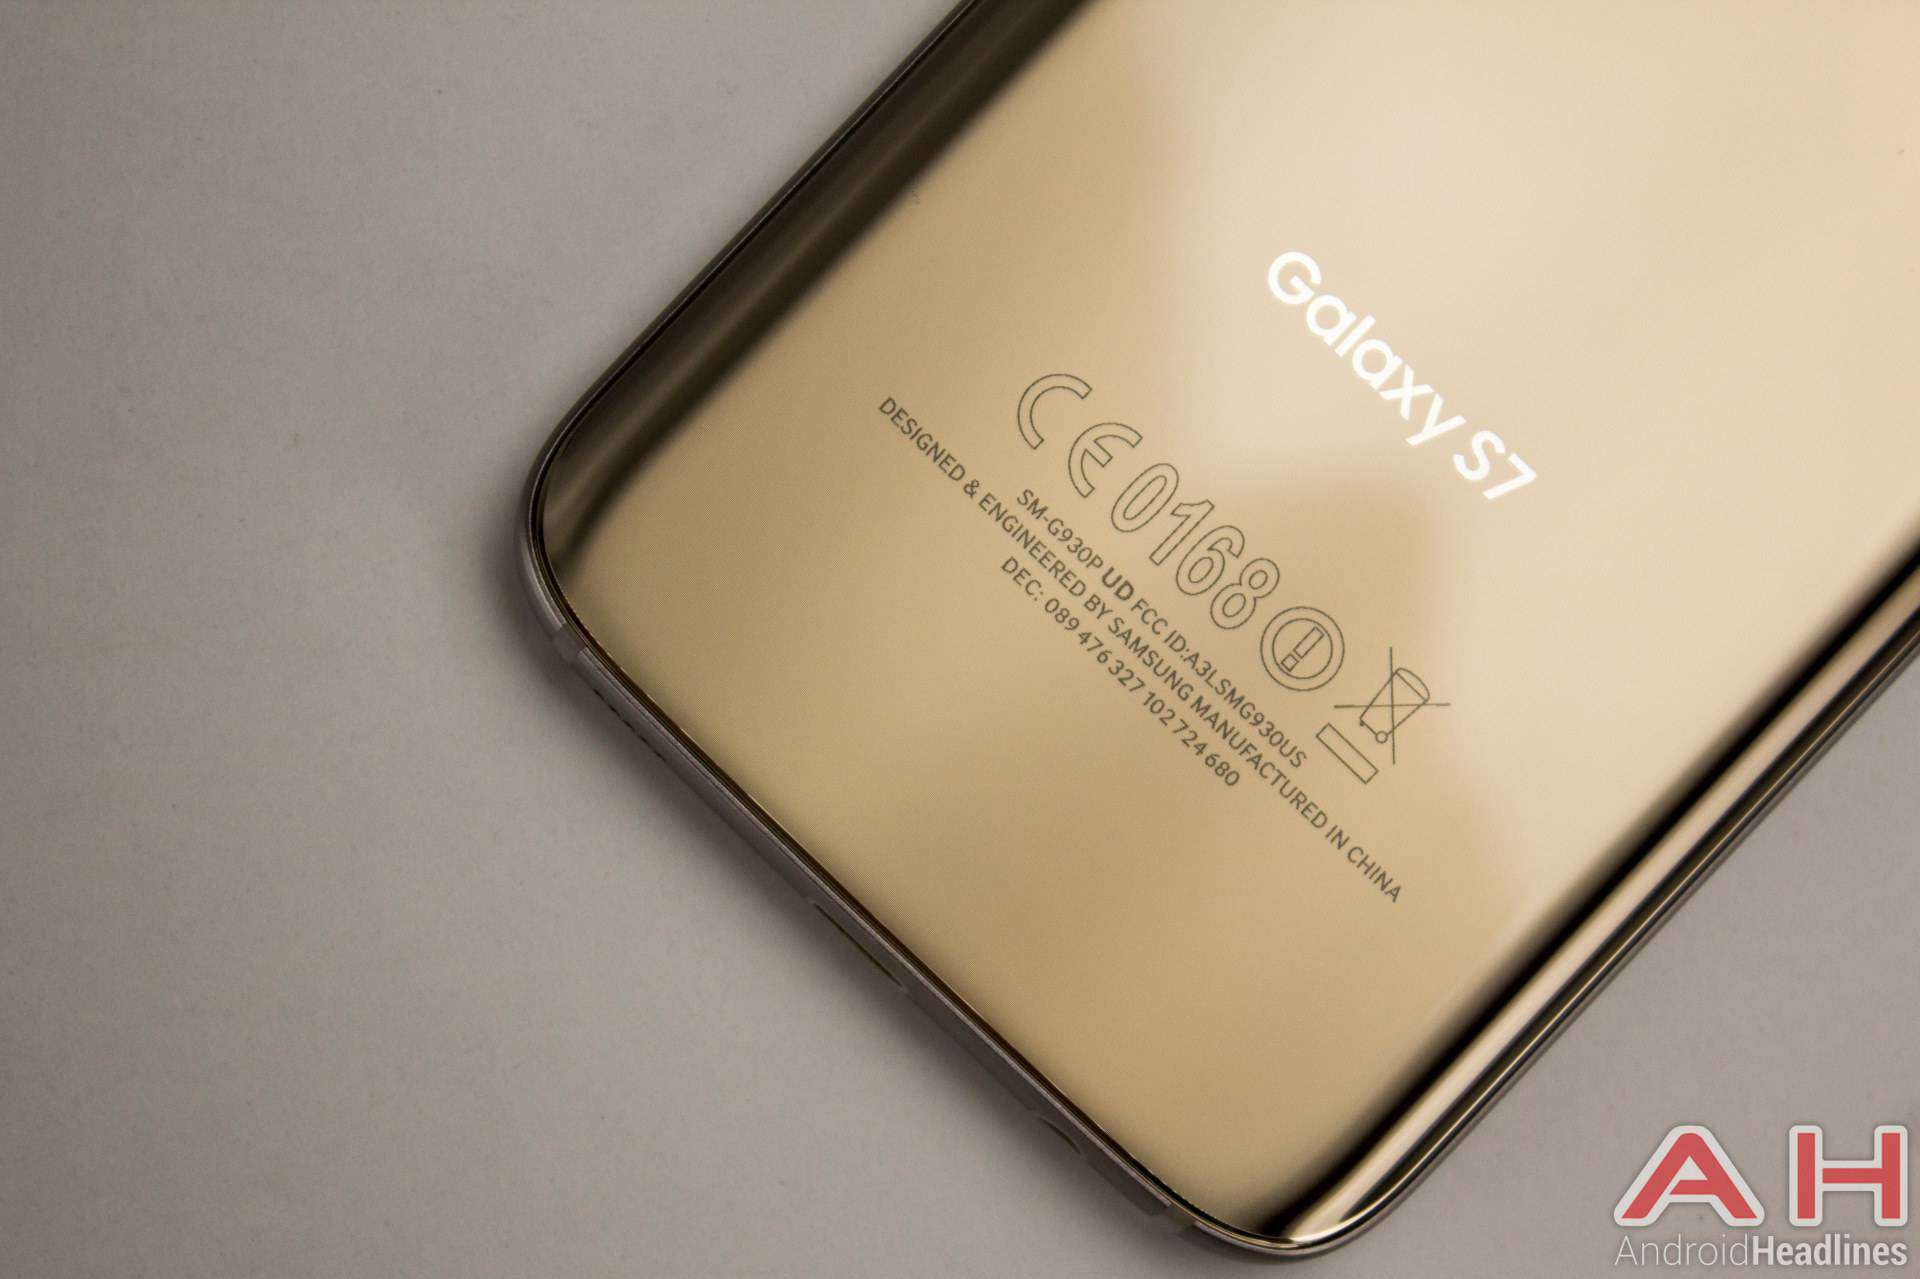 Samsung Galaxy S7 AH NS gold logo